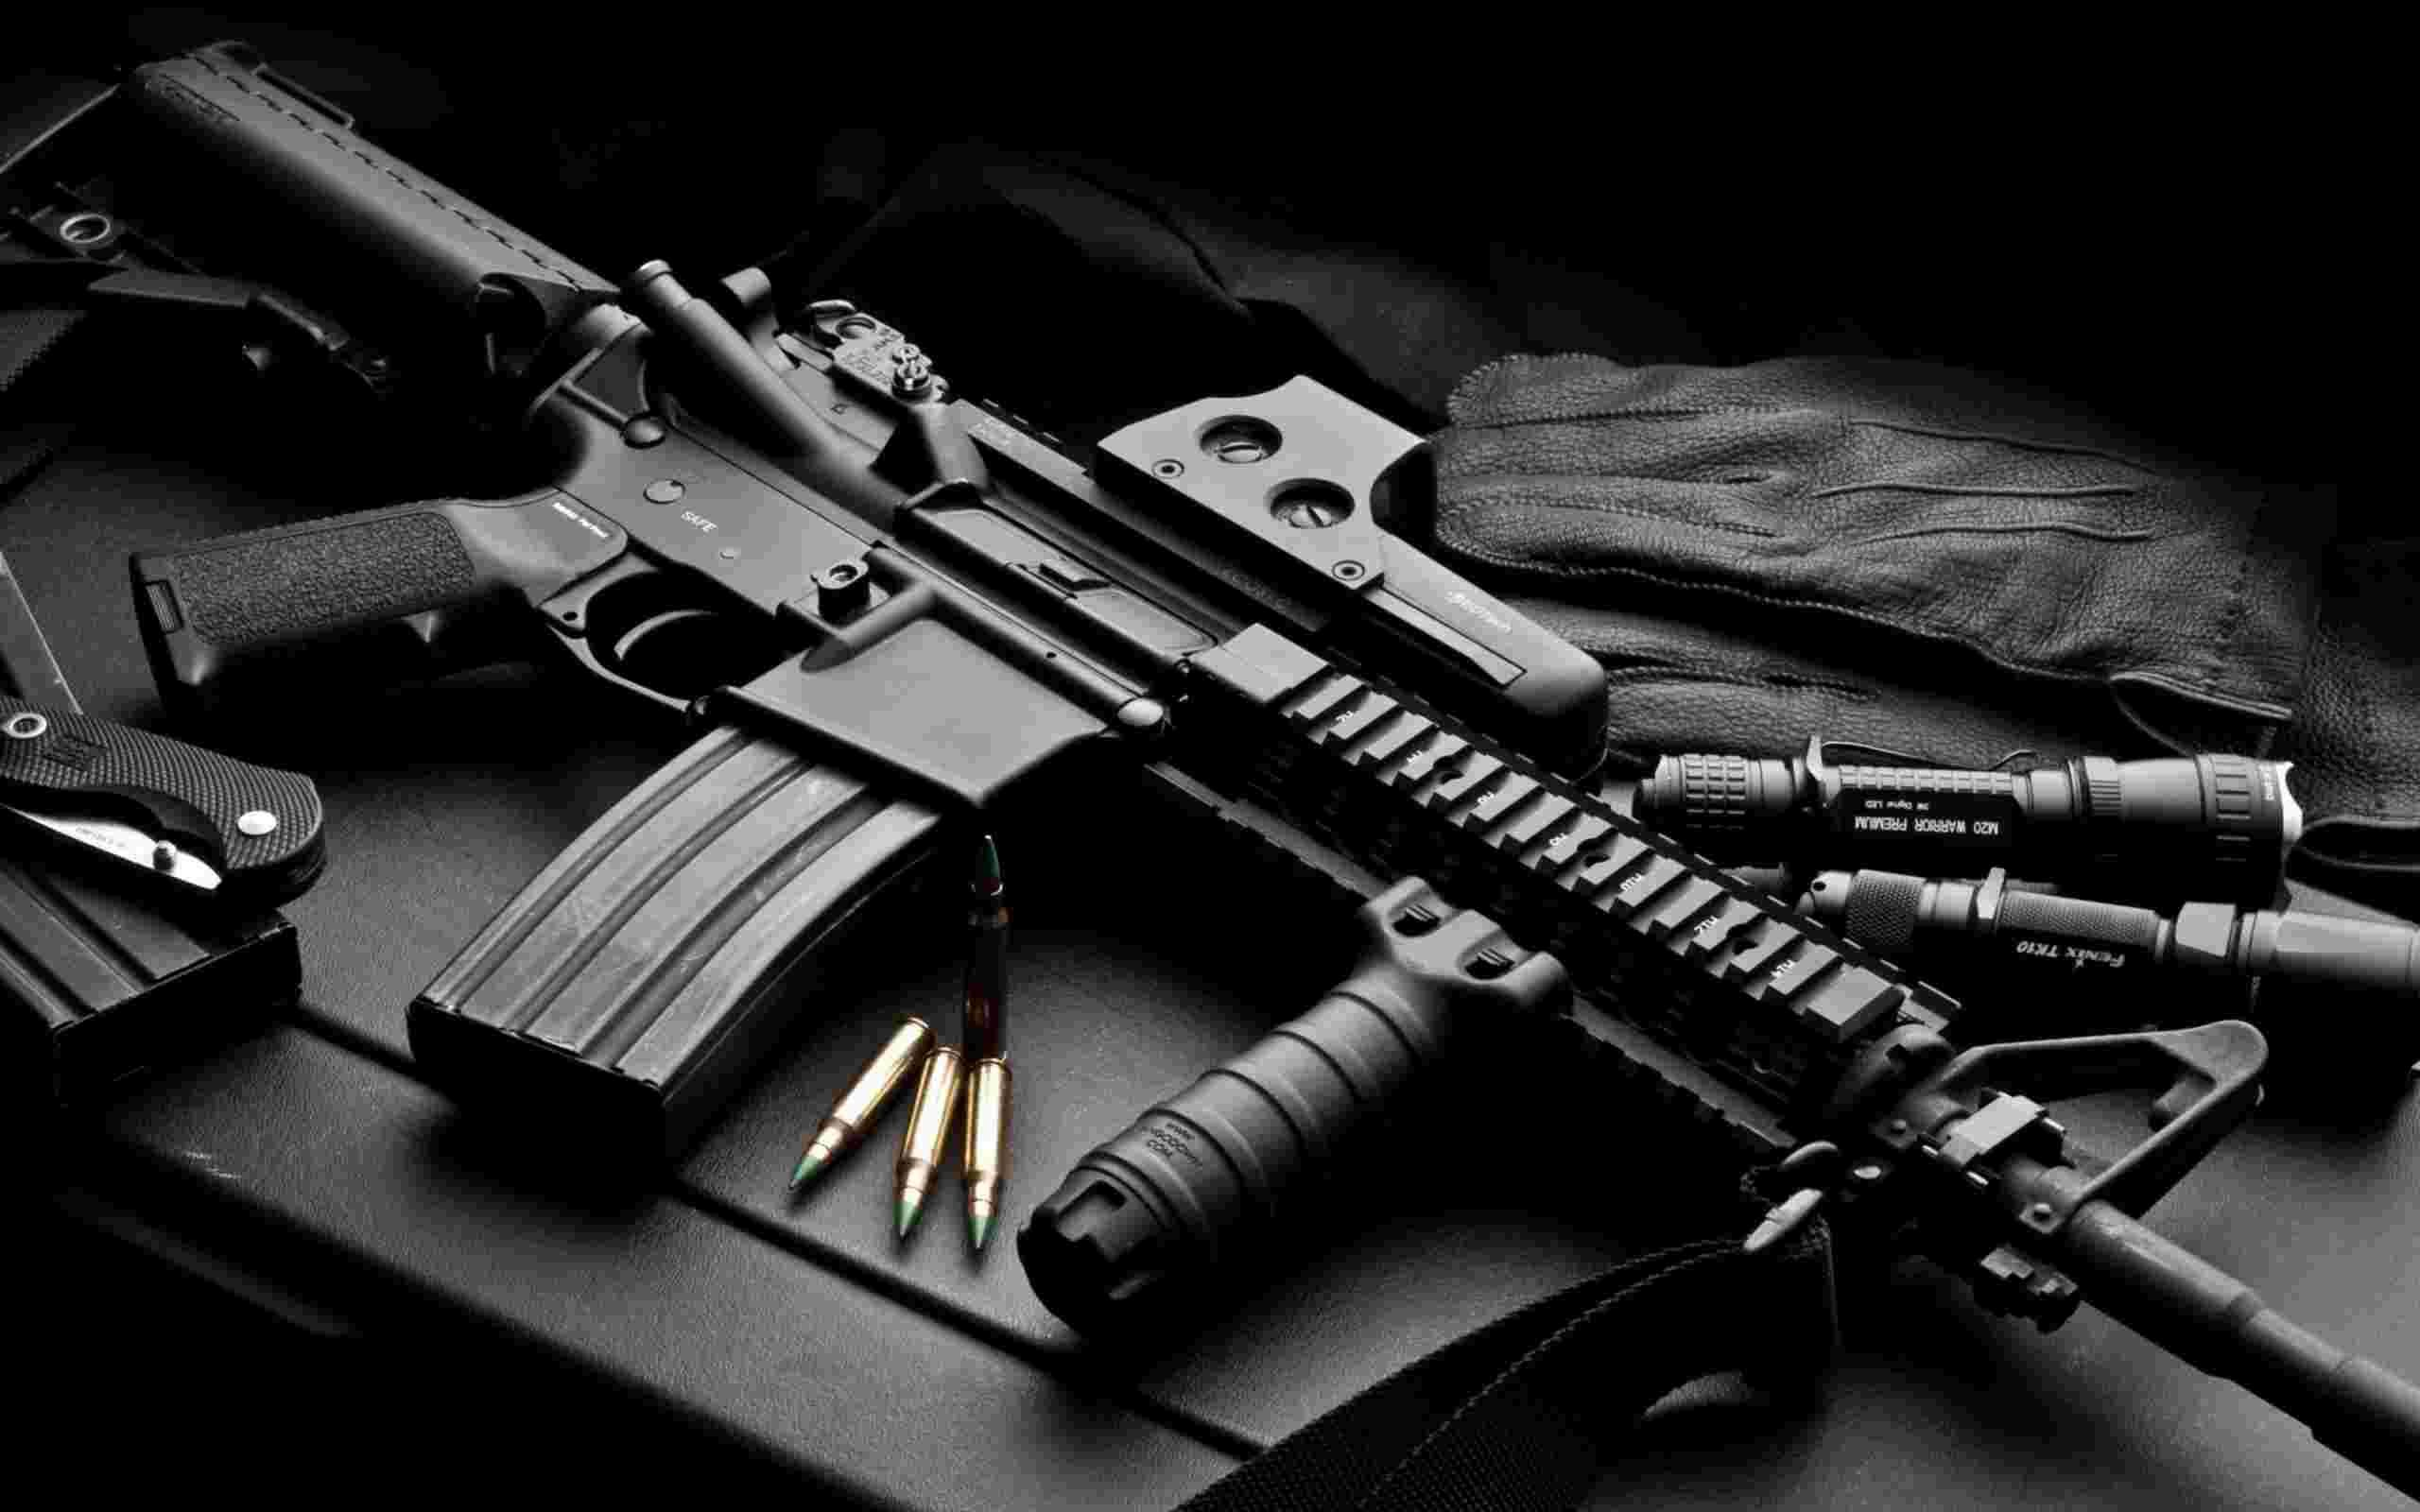 m4a1 carbine wallpaper hd rifles shotguns bows guns firearms